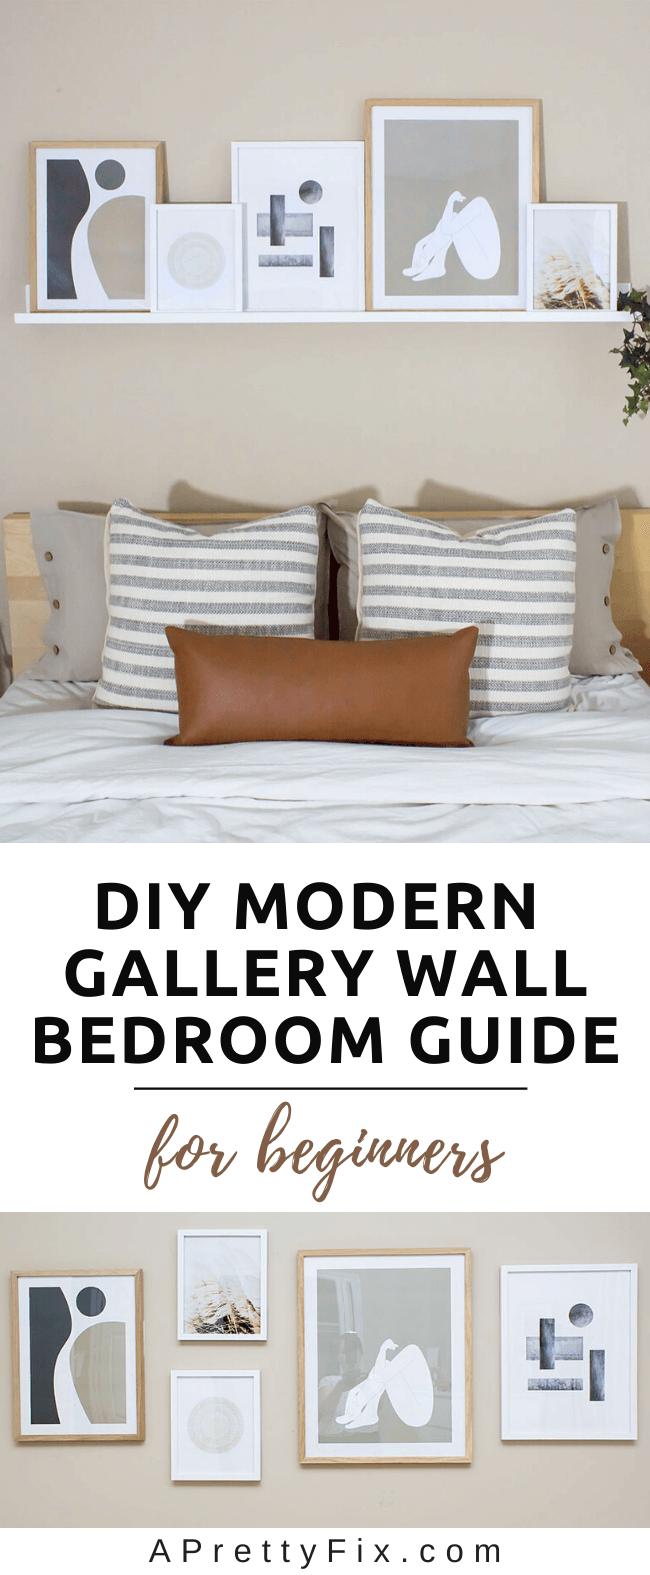 5 Bedroom Gallery Wall Styles Rain And Rowe